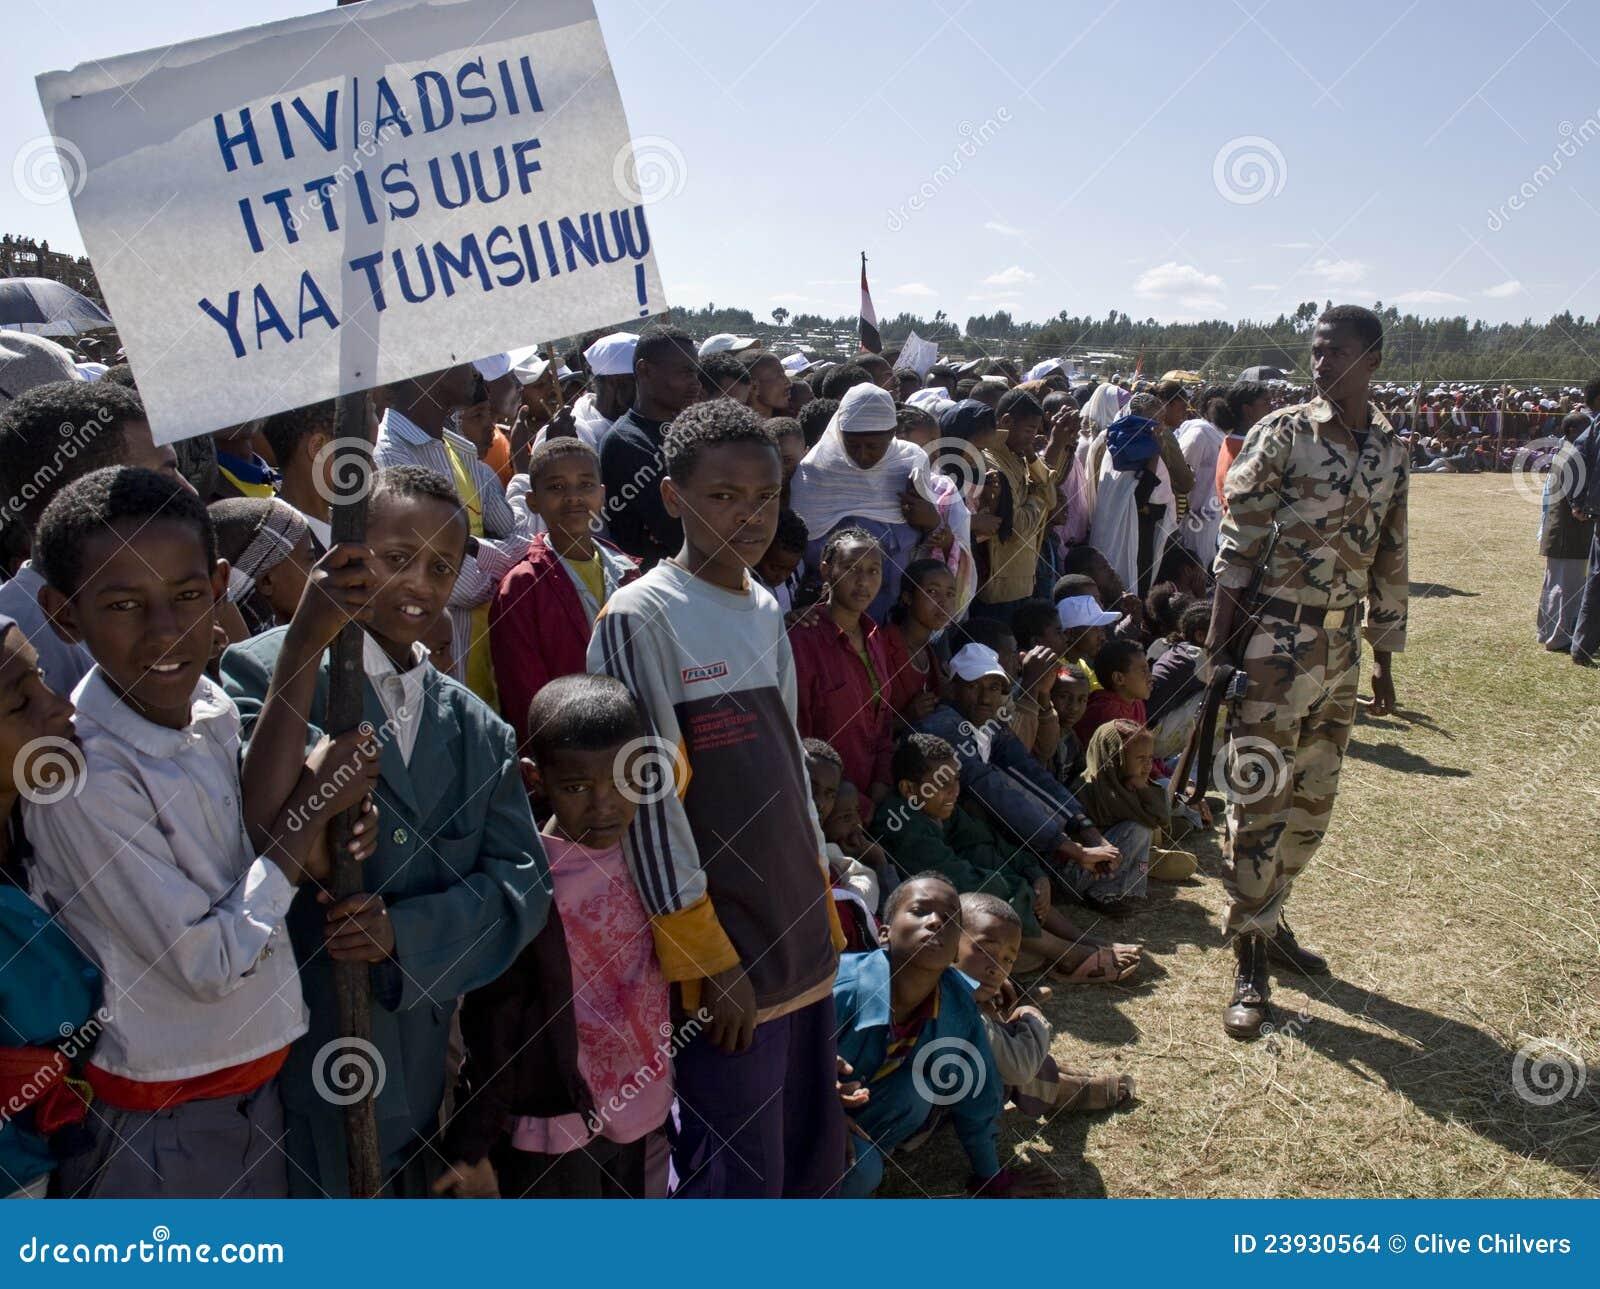 Children holding an HIV banner